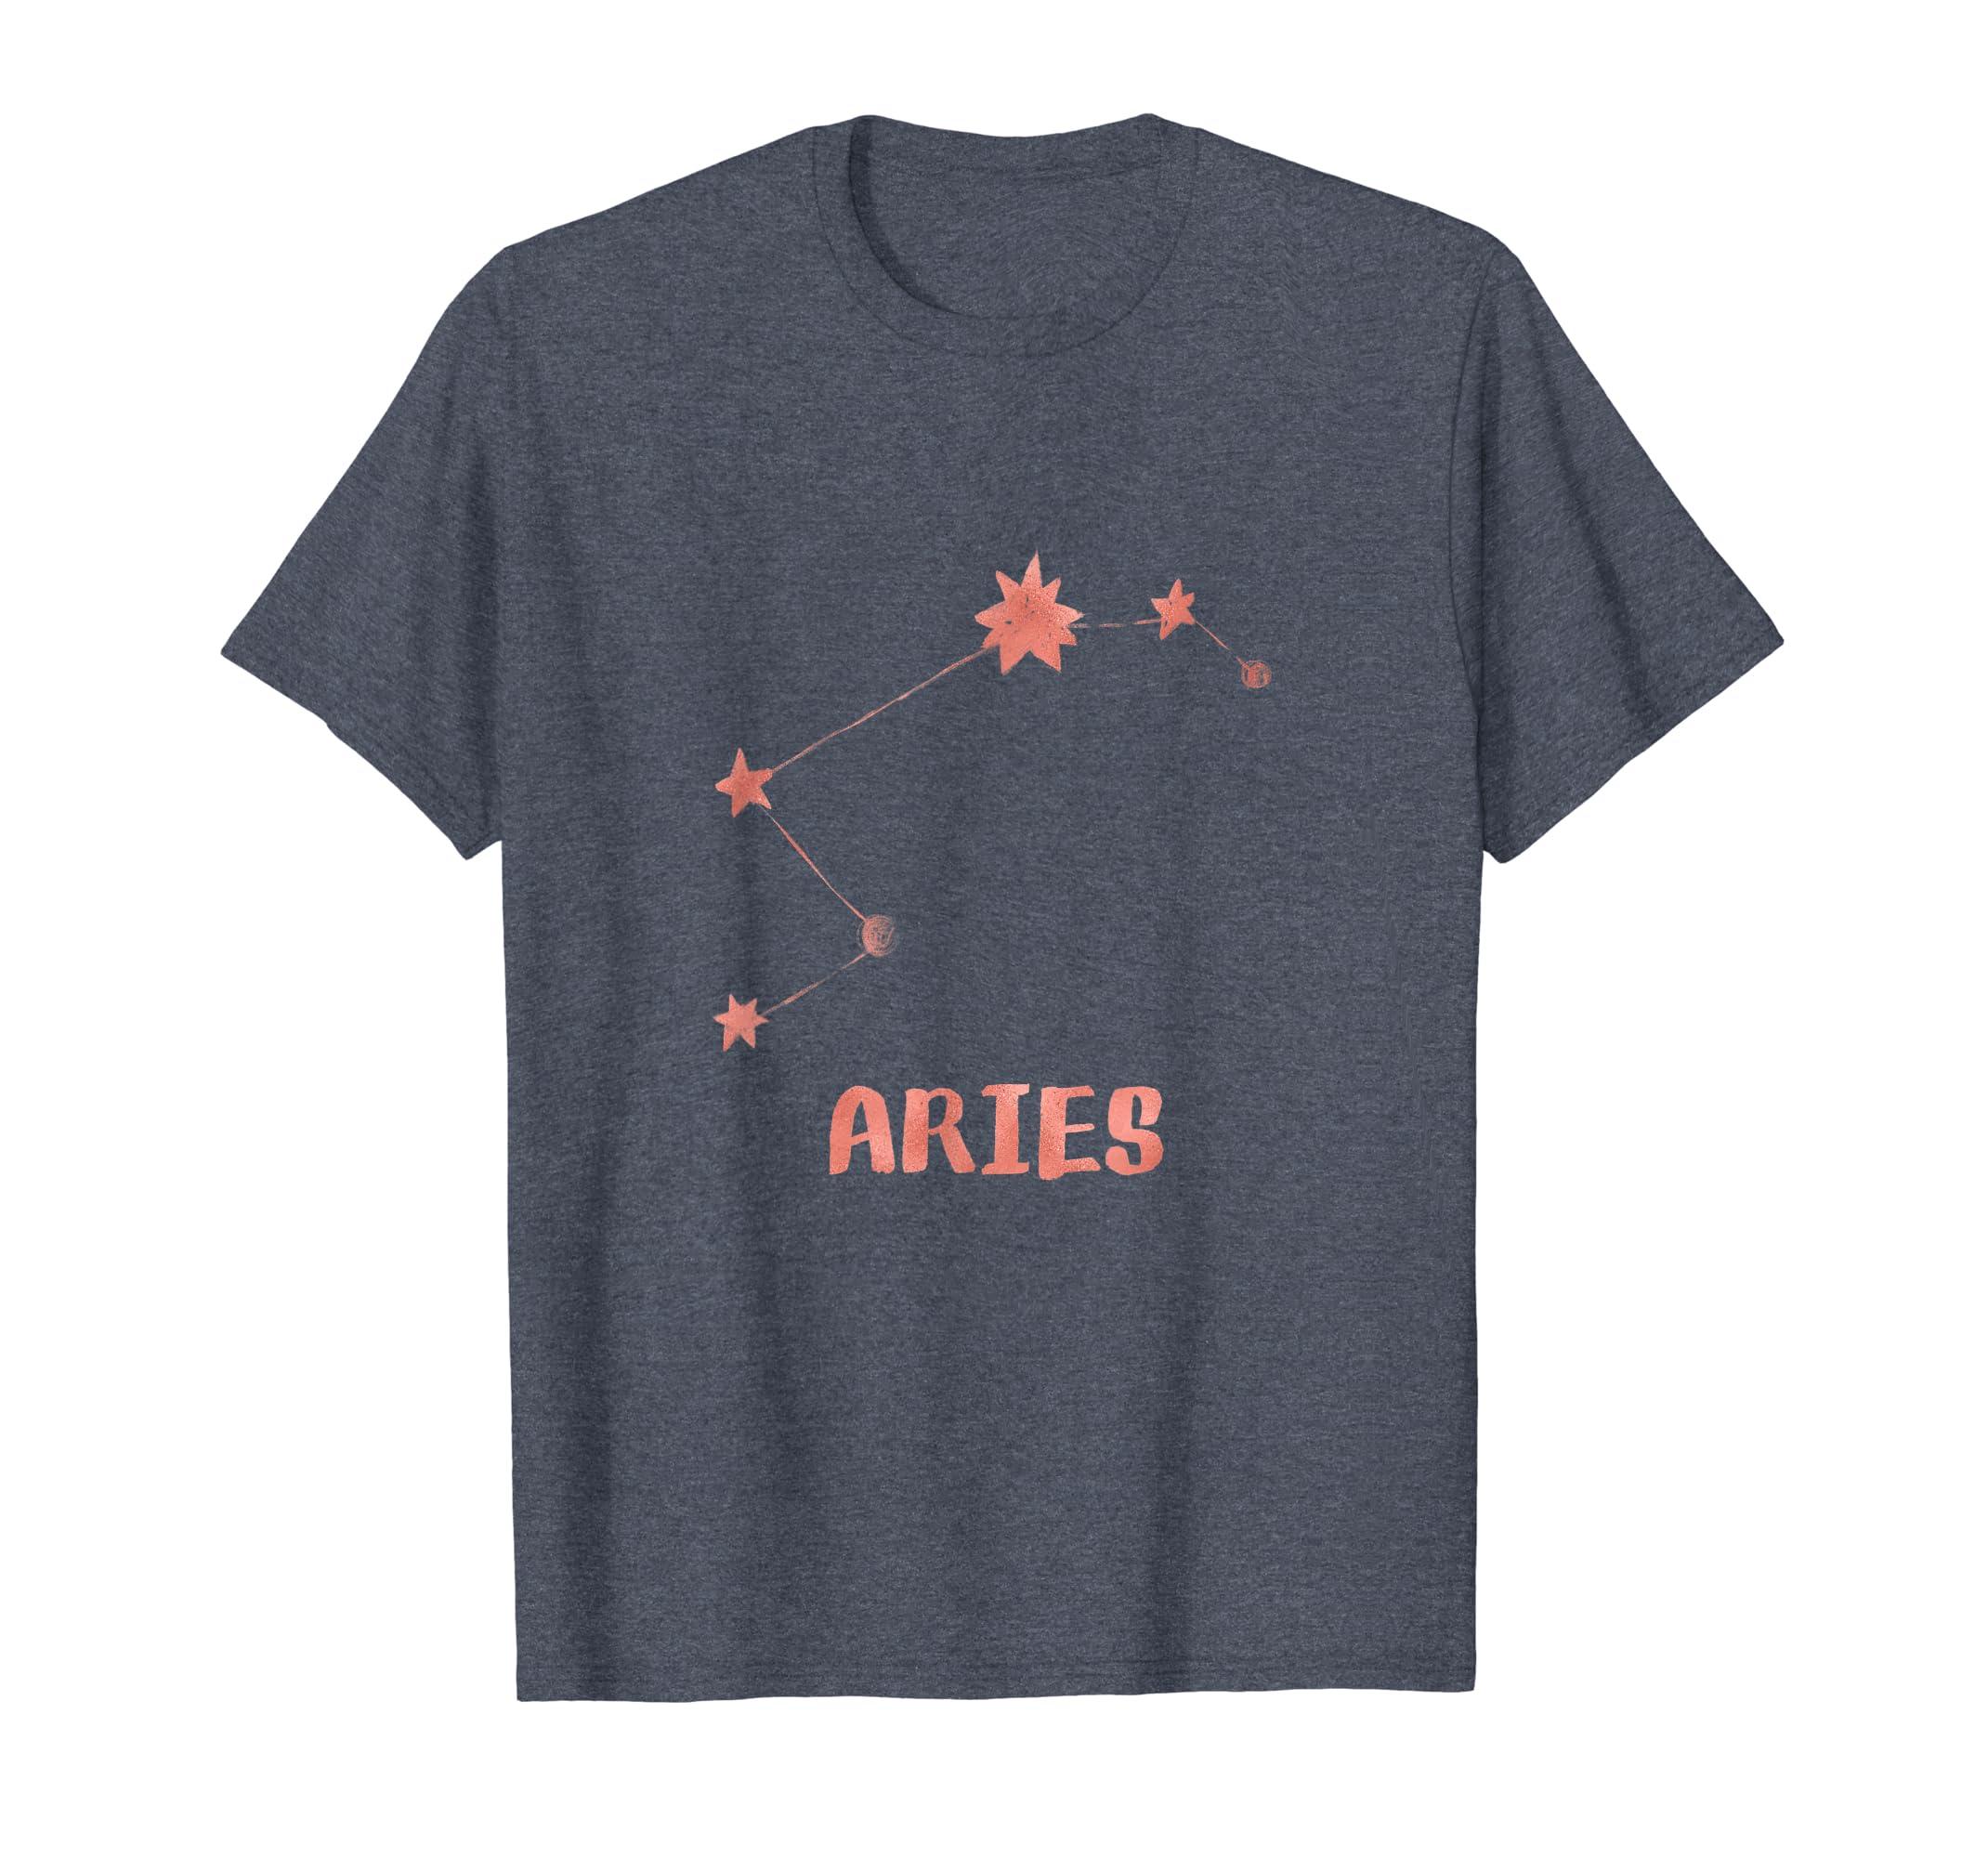 Aries Astrology Shirt Stars March Birthday Gift Girls